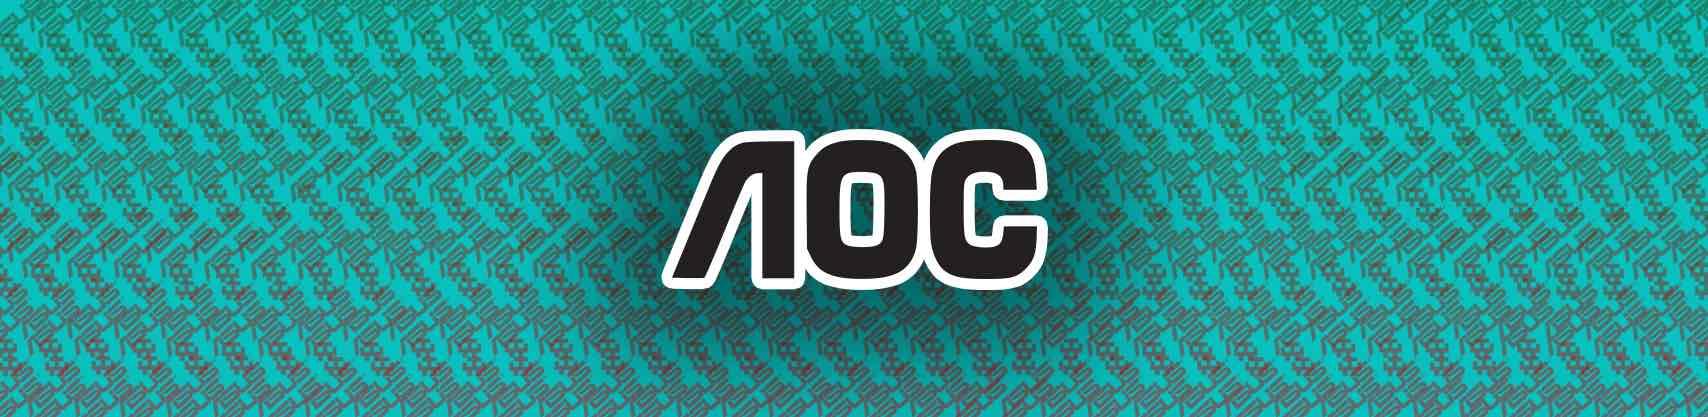 AOC E2043FK Manual